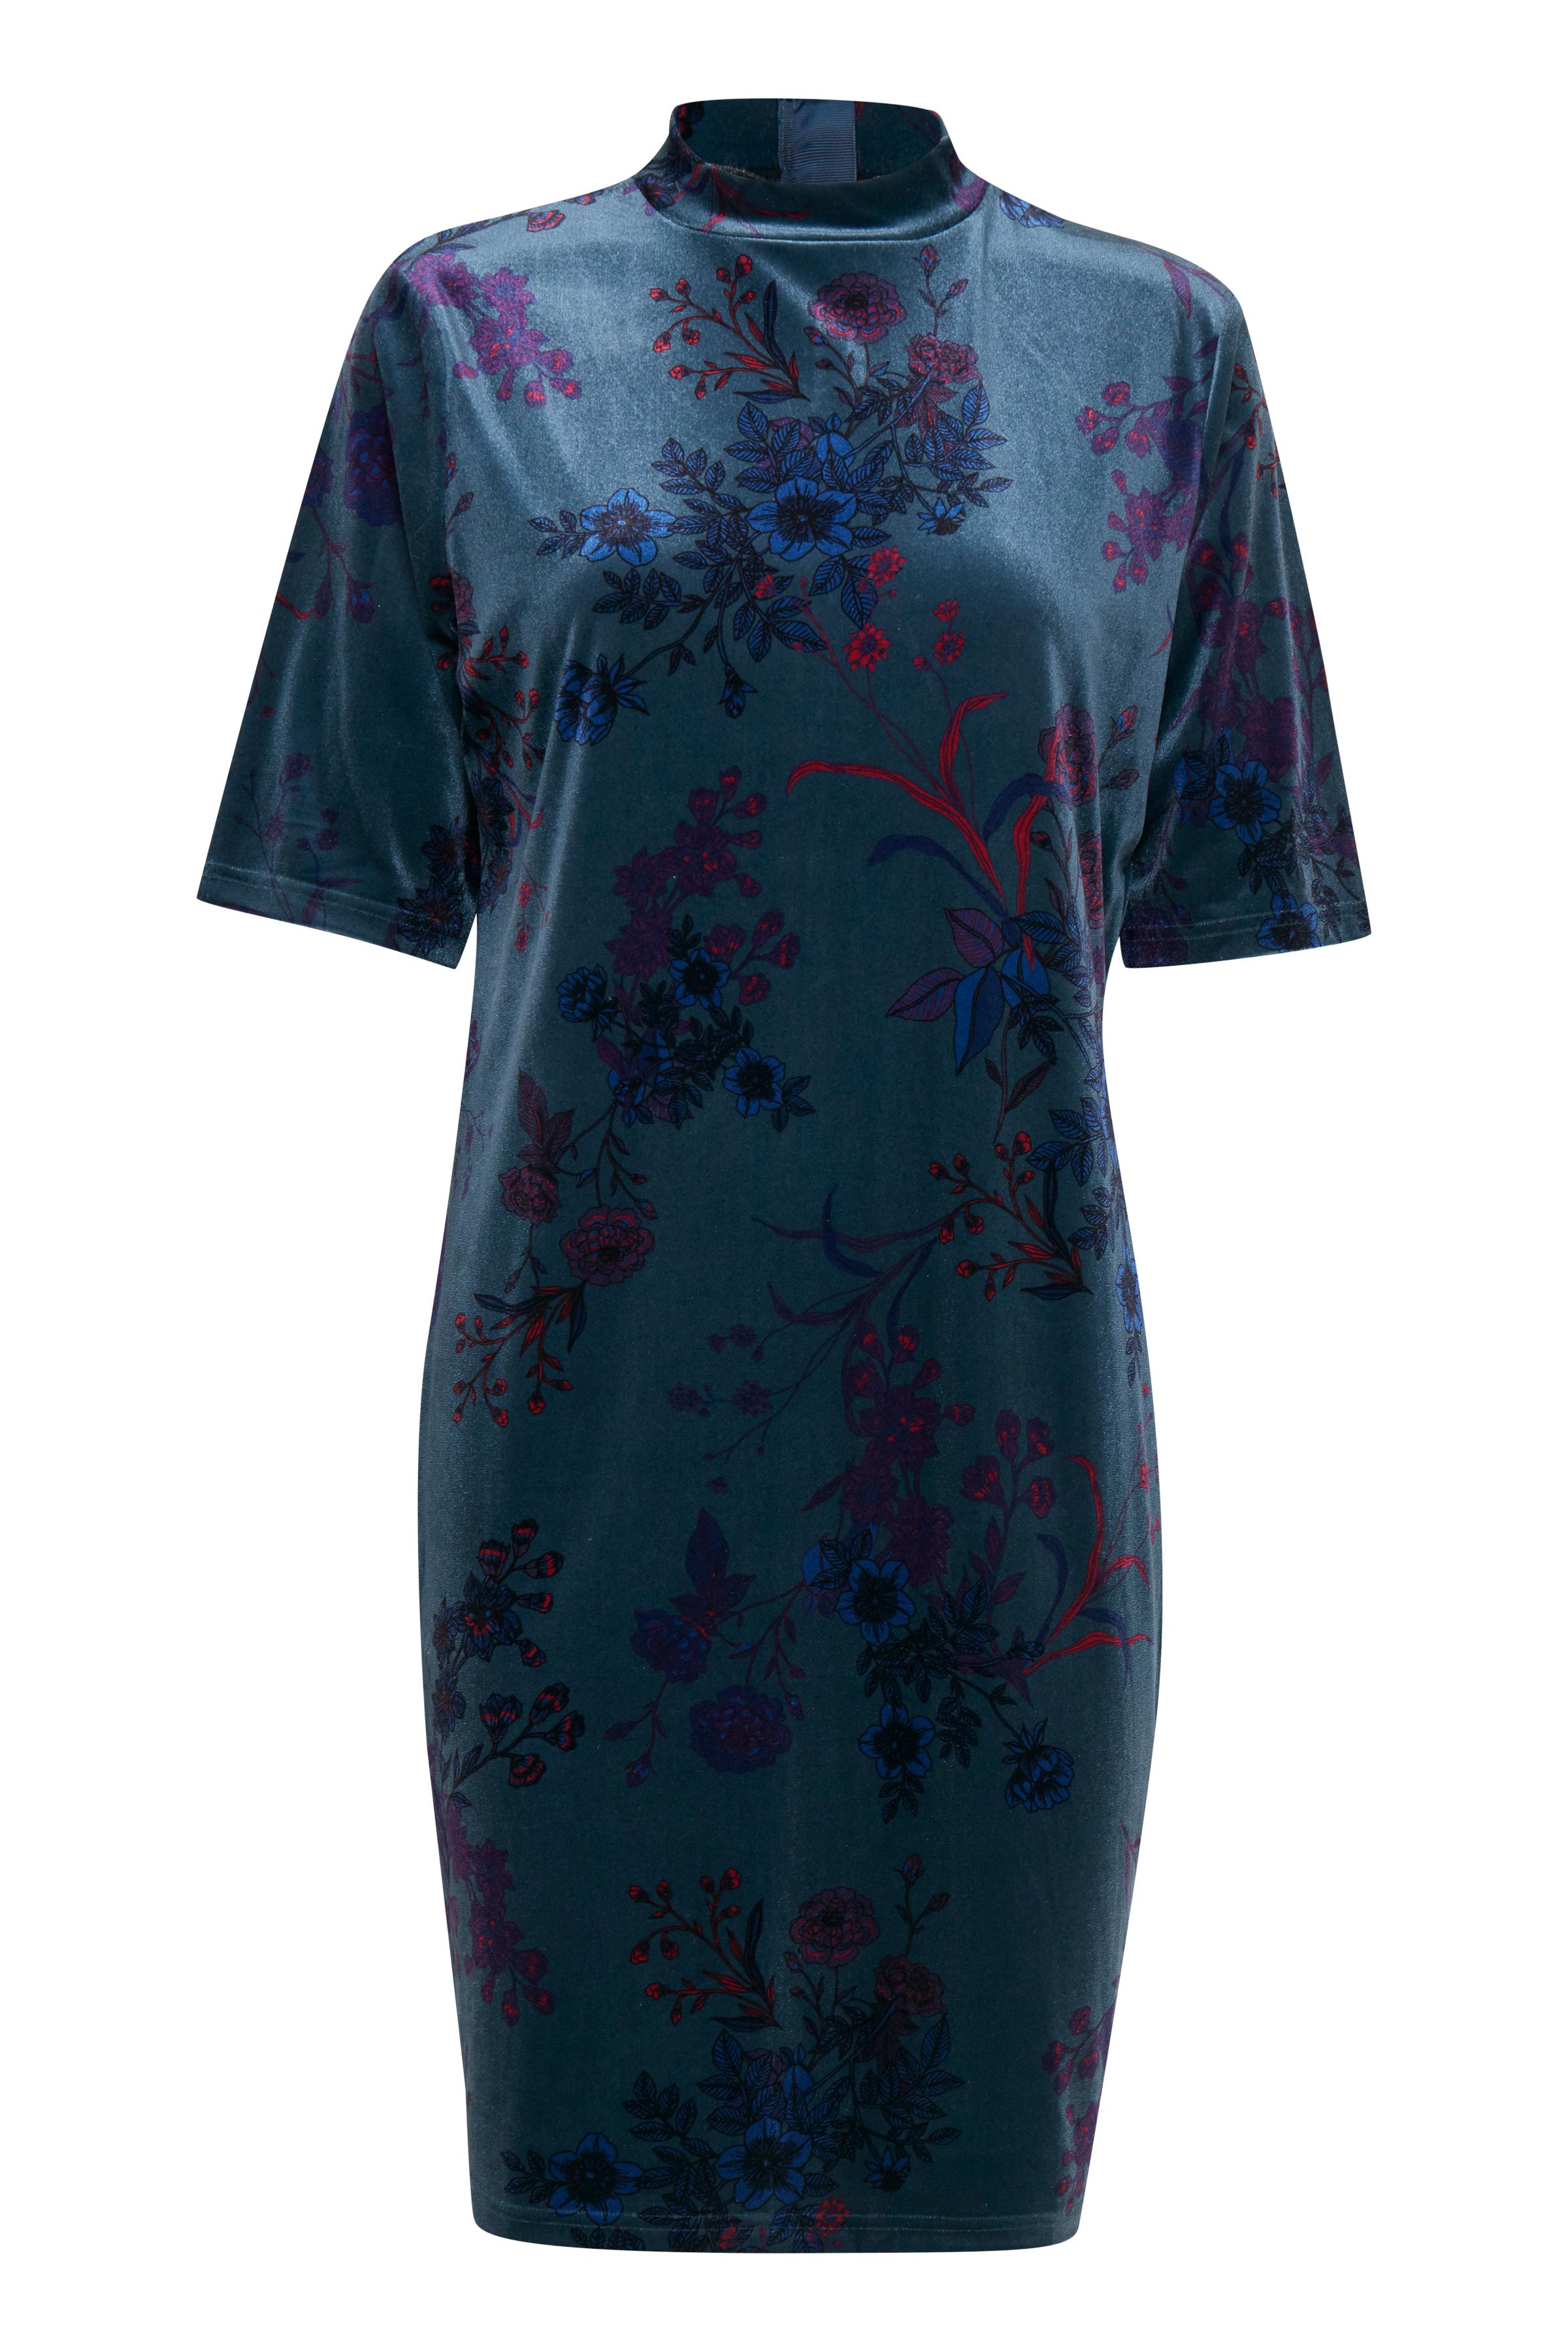 Copenhagen night combi Jersey dress from b.young – Buy Copenhagen night combi Jersey dress from size XS-XXL here